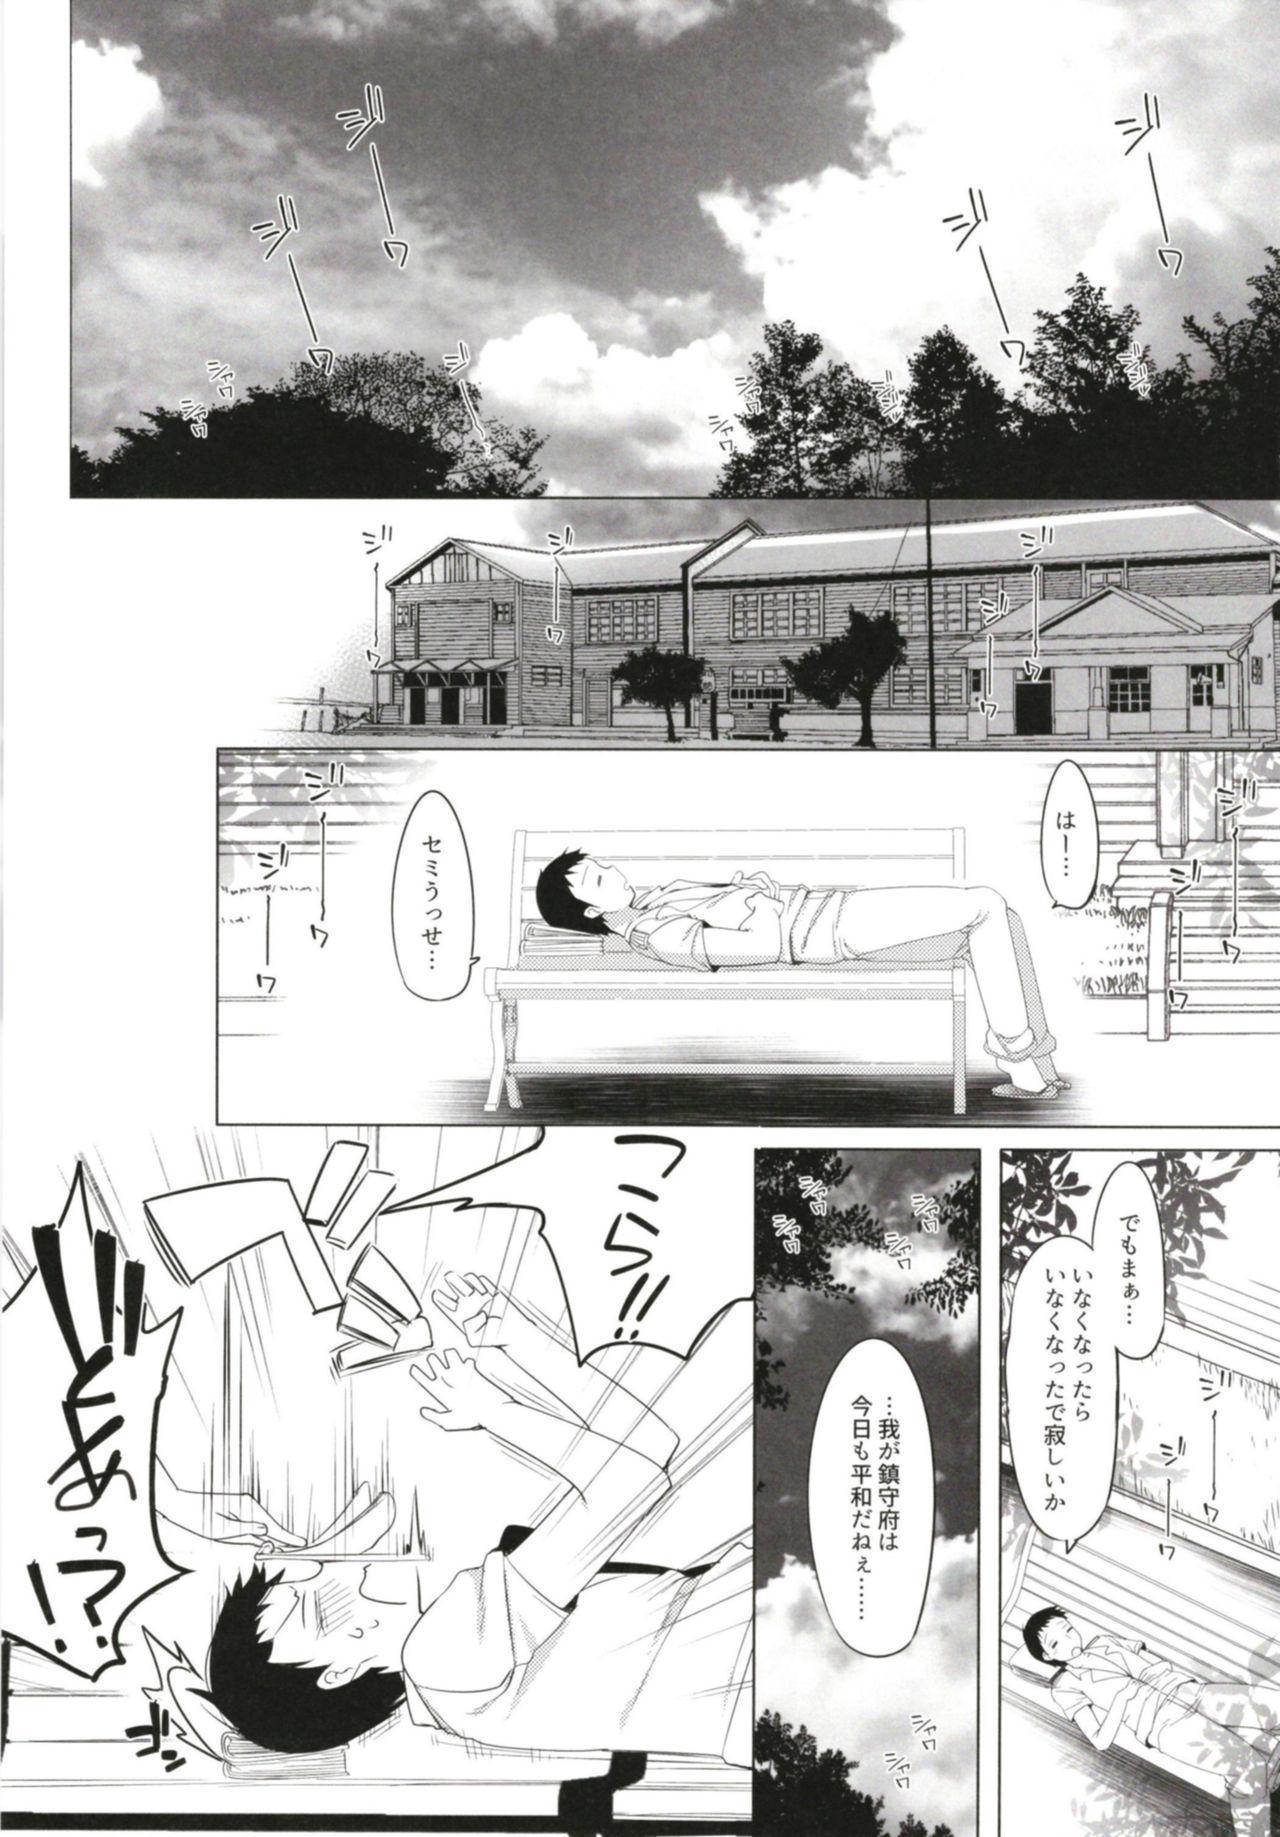 [French letter (Fujisaki Hikari)] Hitonatsu no Ayamachi -I-401 Soushuuhen- (Kantai Collection -KanColle-) [Digital] 34